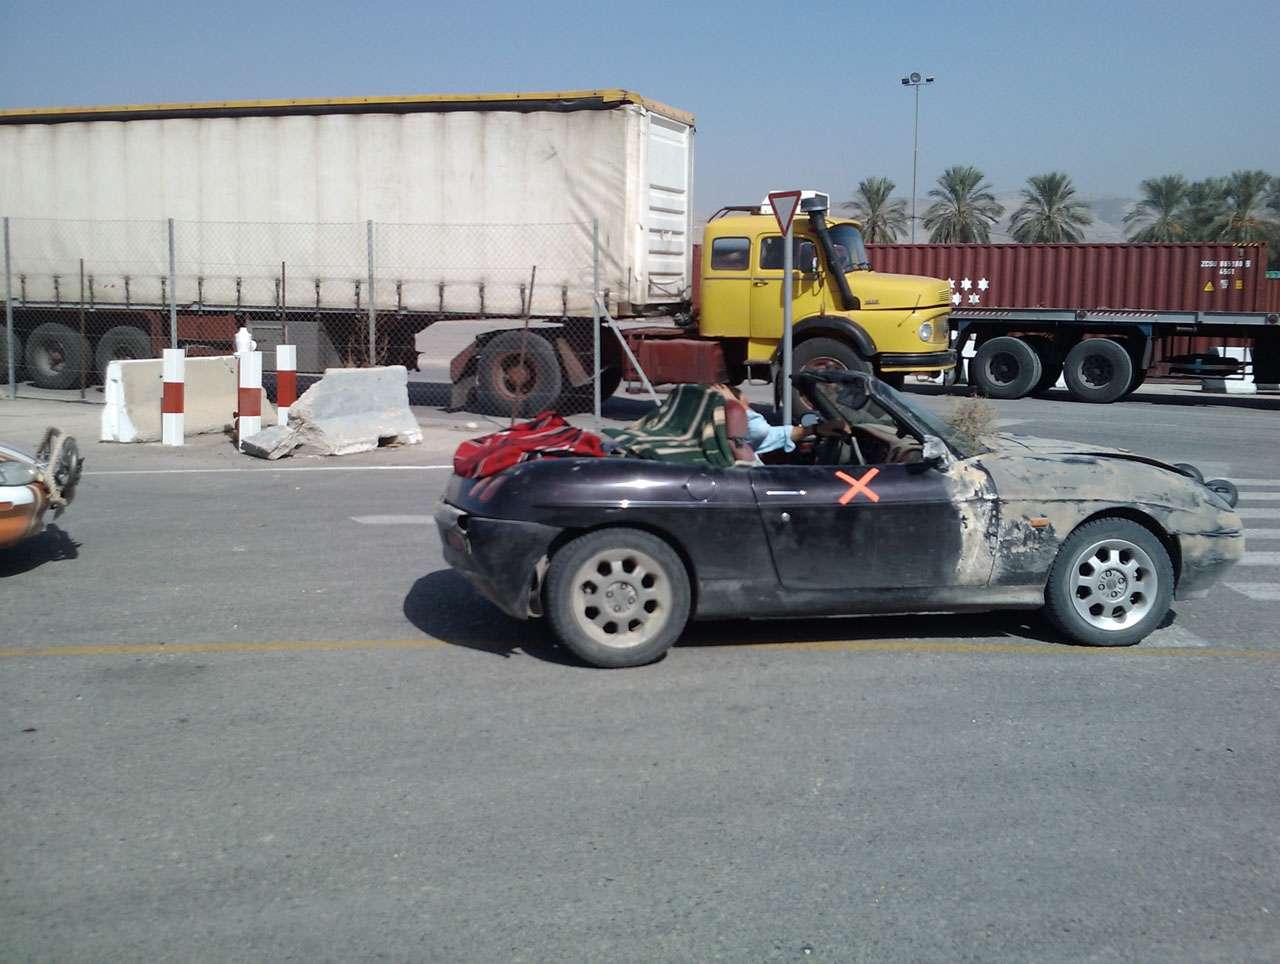 Top Gear Izrael padziernik 2010